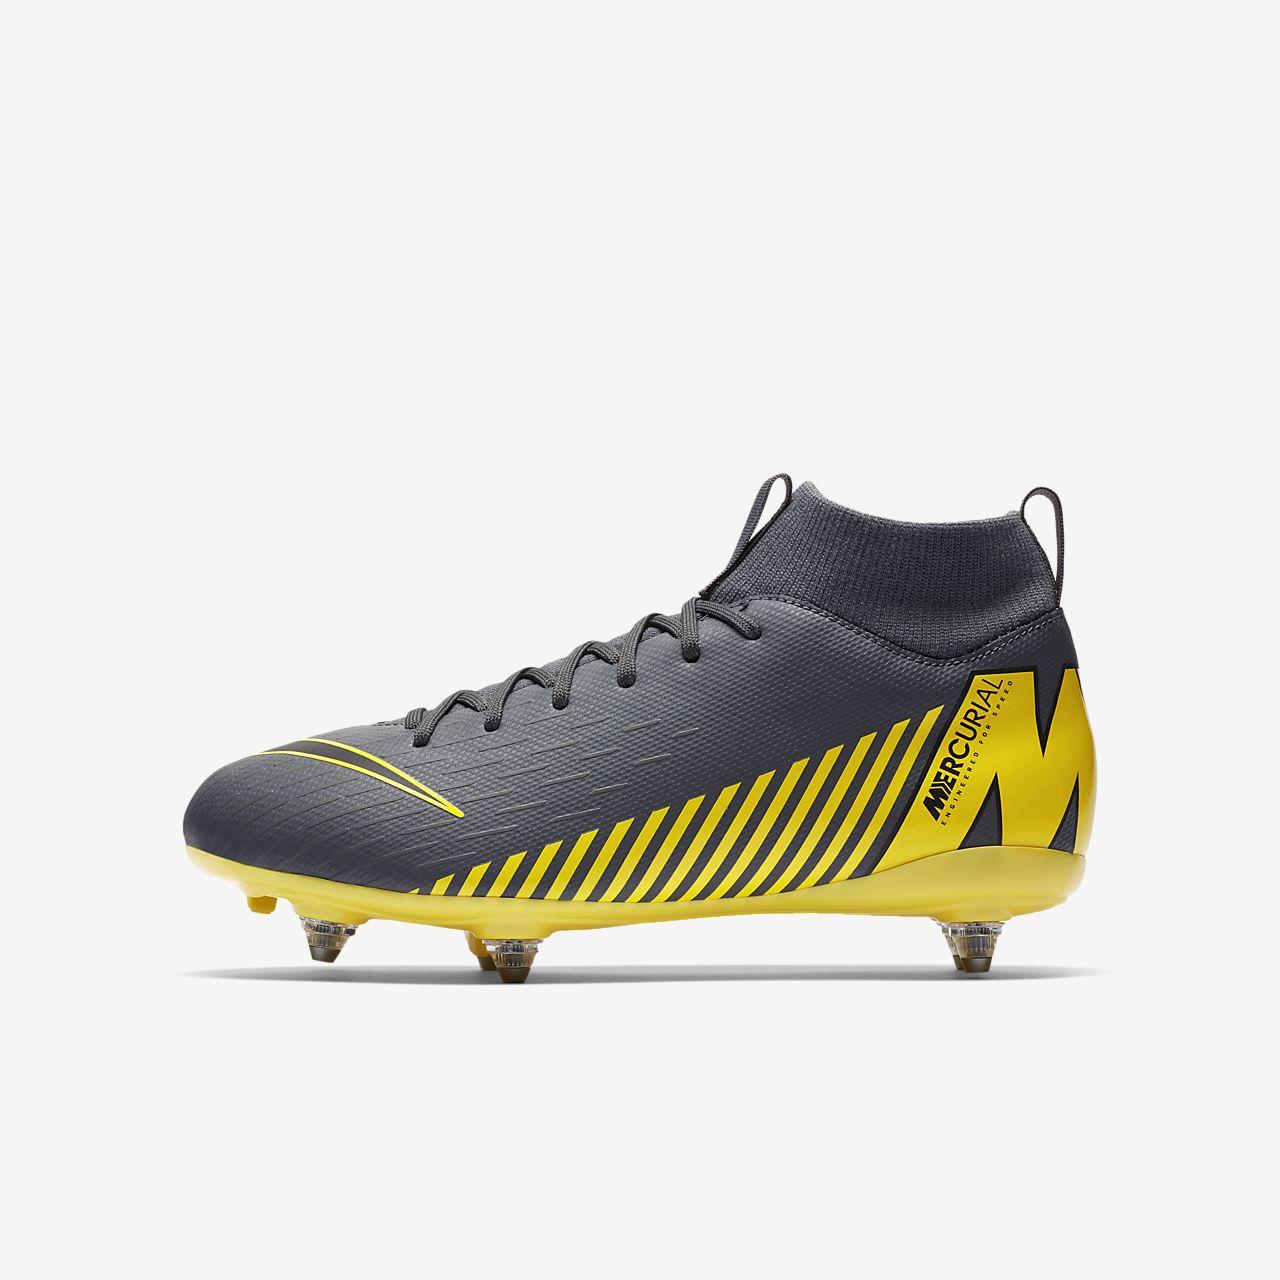 quality design 8f898 5603b ... Chaussure de football à crampons pour terrain gras Nike Jr. Mercurial  Superfly VI Academy SG